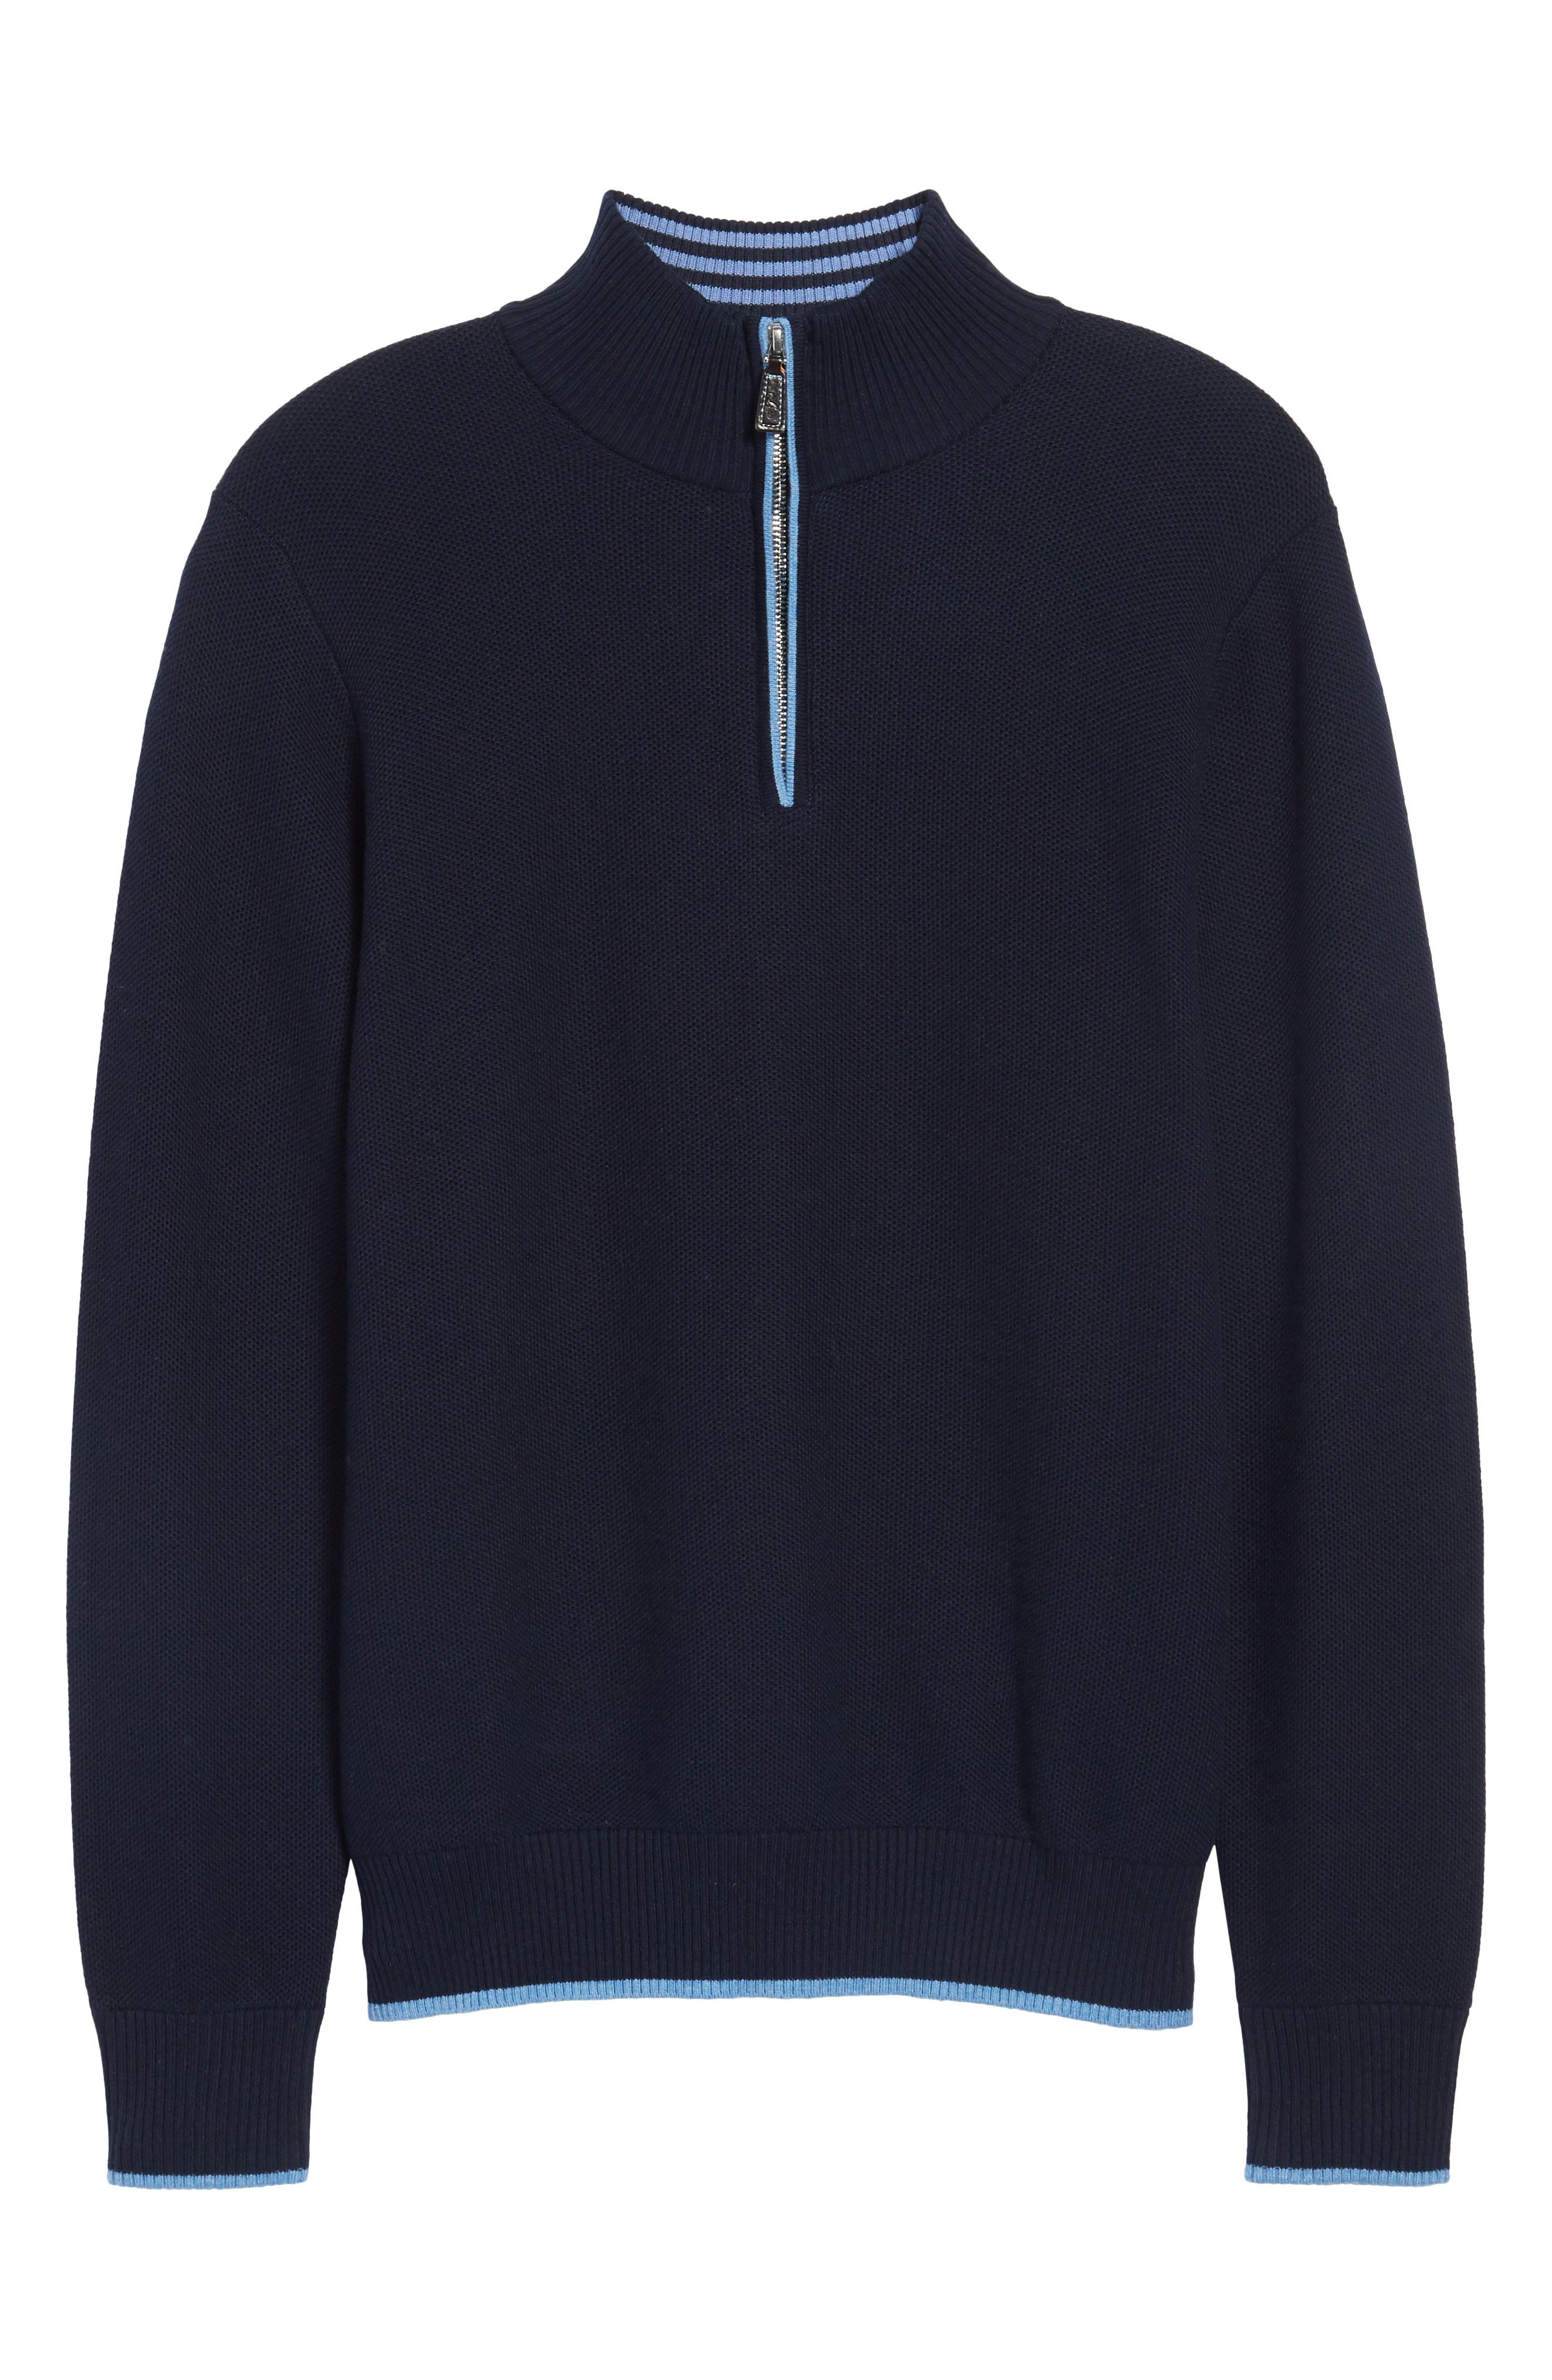 TAILORBYRD,                             Killona Tipped Quarter Zip Sweater,                             Alternate thumbnail 6, color,                             410